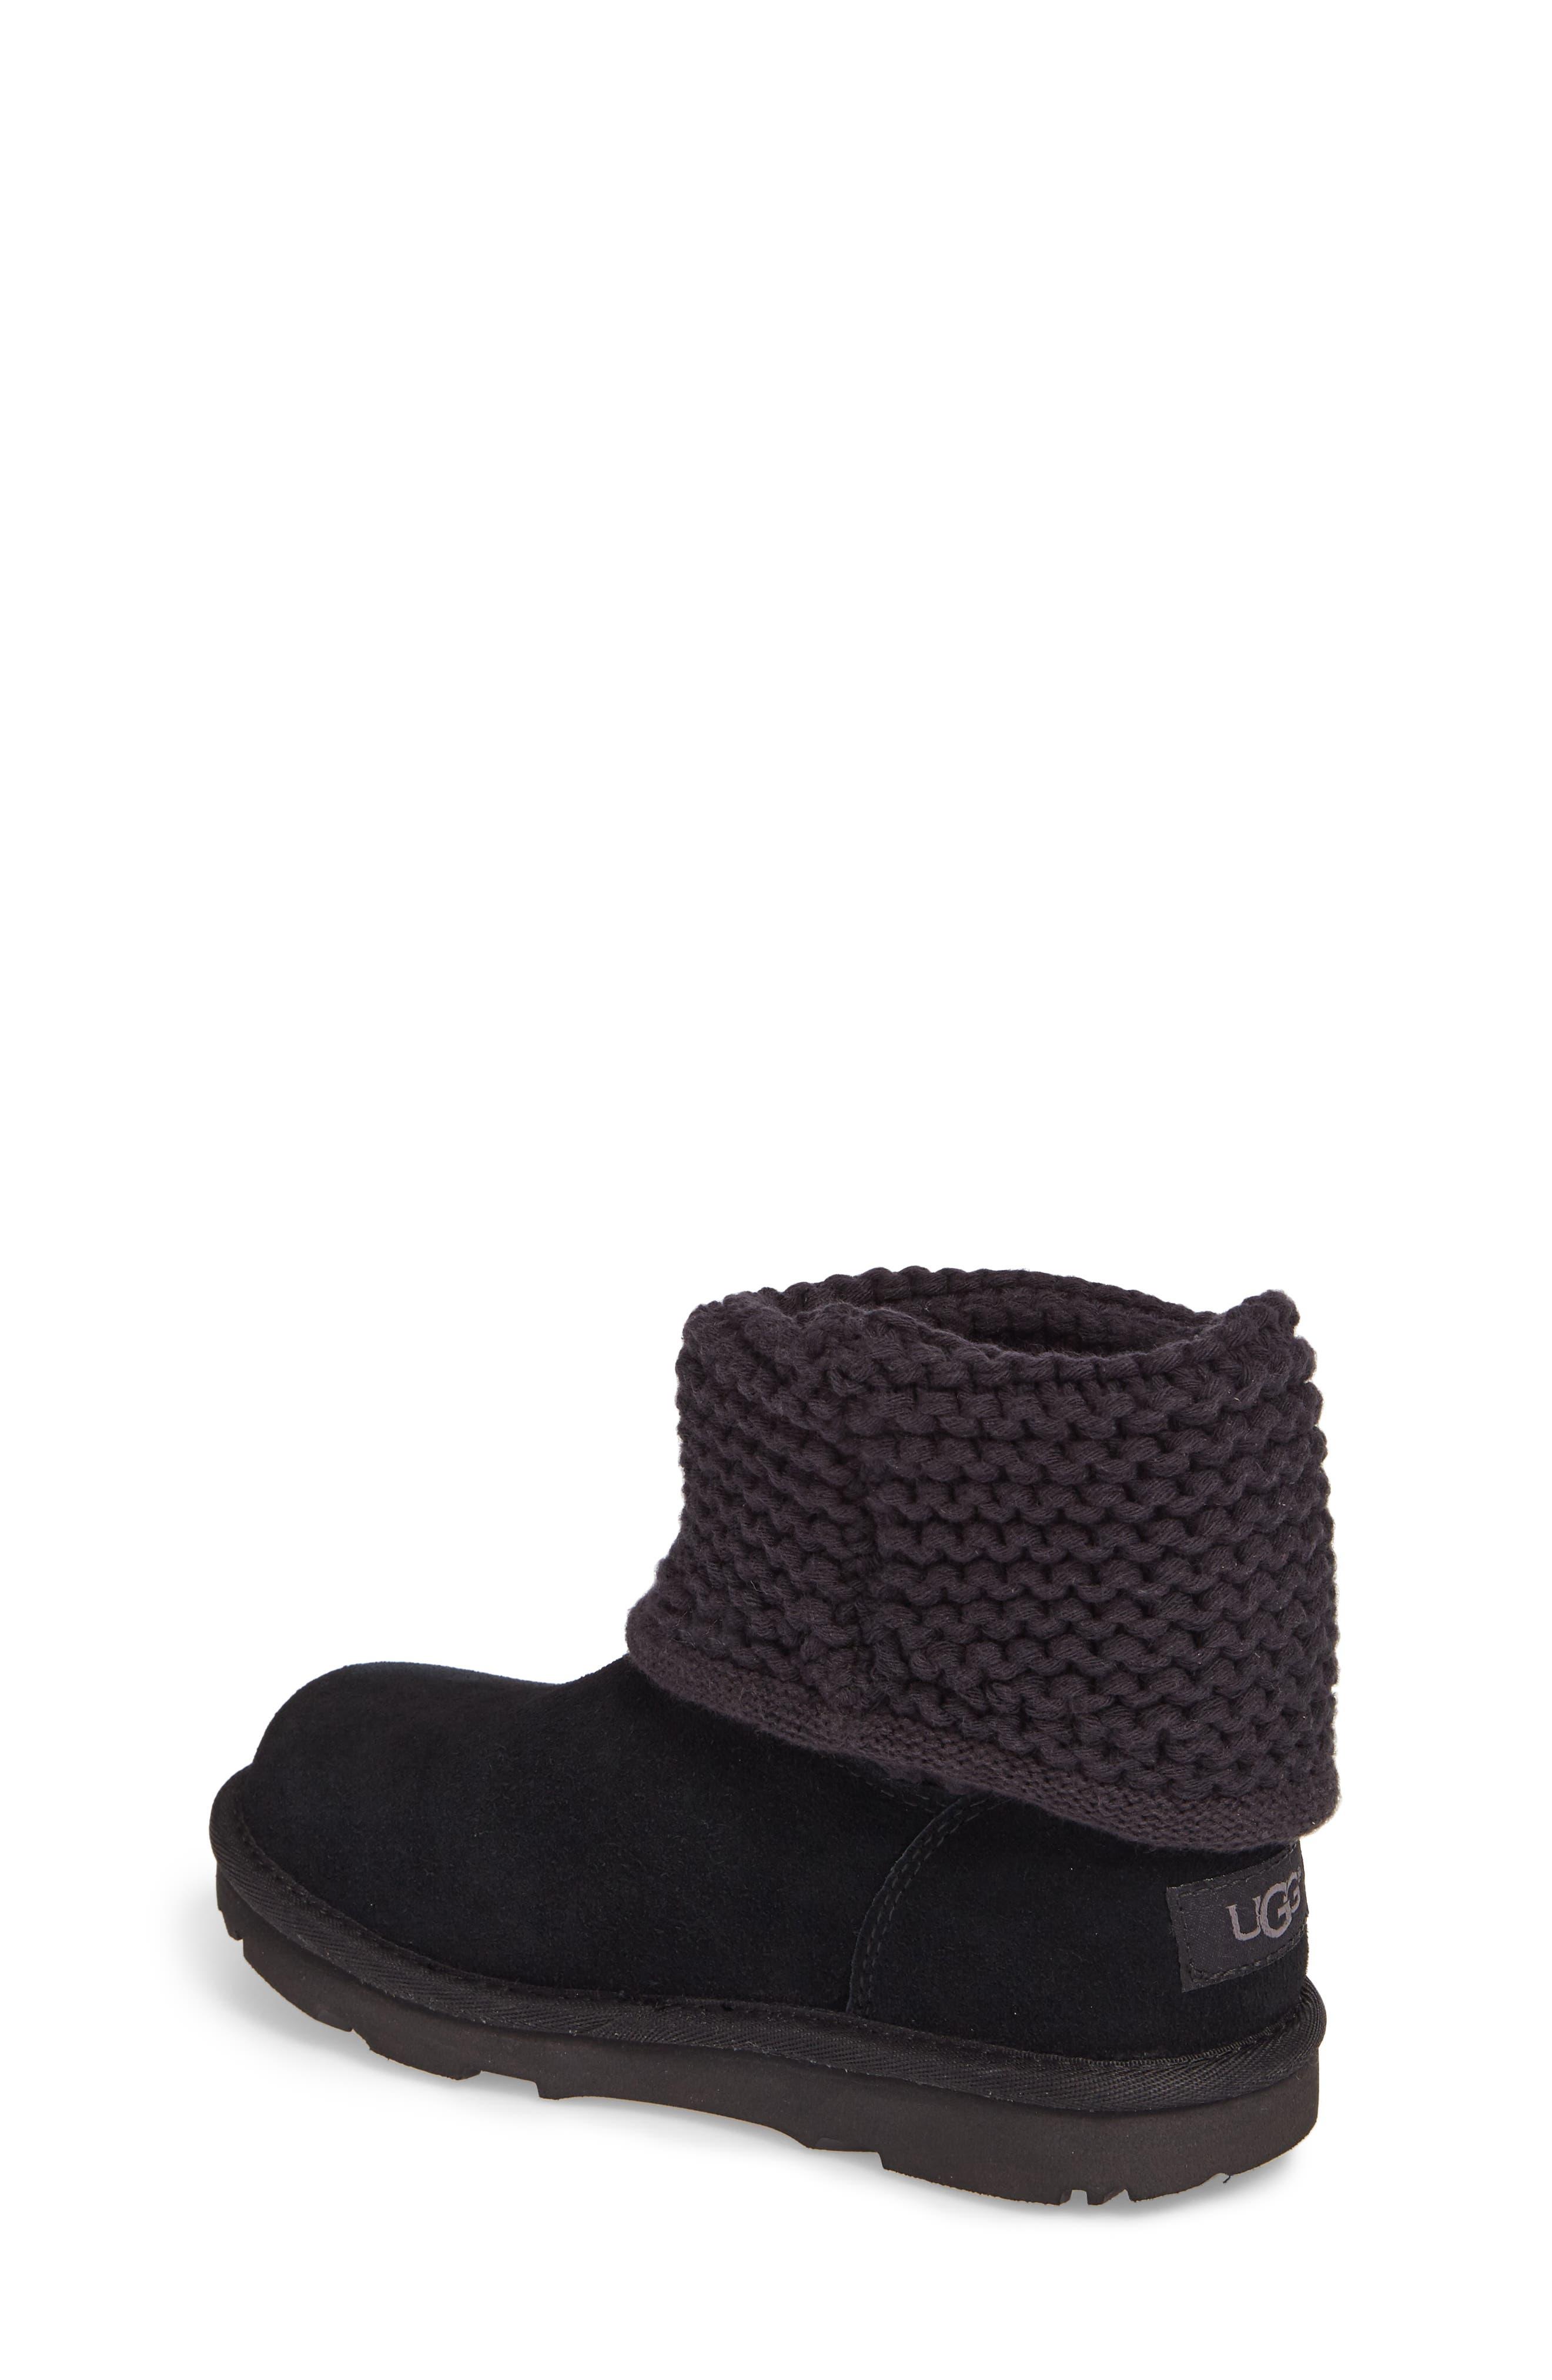 Darrah II Knit Cuff Boot,                             Alternate thumbnail 2, color,                             001